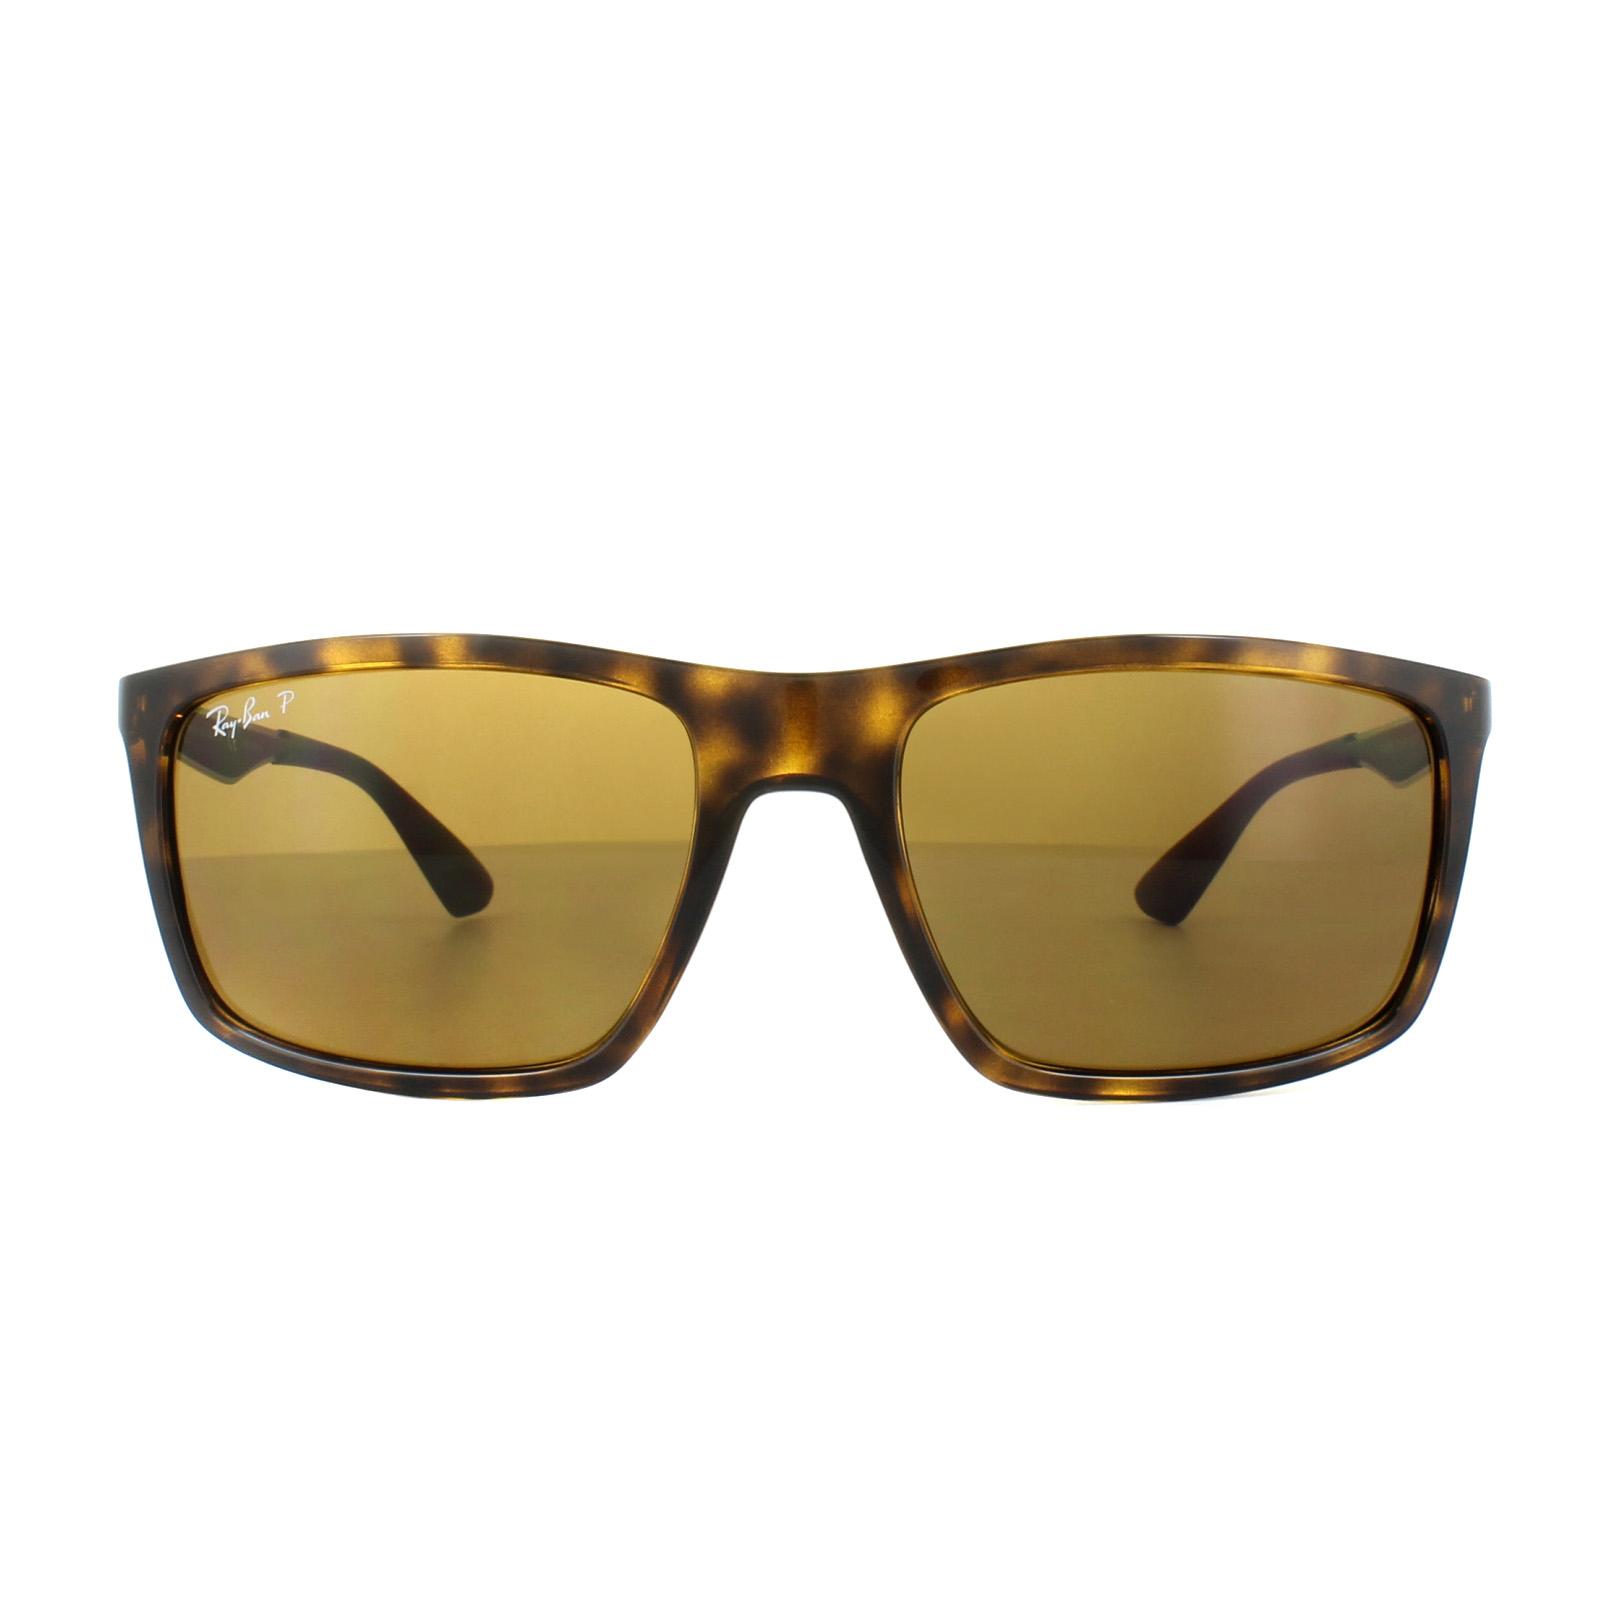 32faa5e3f4 ... discount sentinel ray ban sunglasses 4228 710 83 havana gunmetal brown  b 15 polarized 40c88 a044c